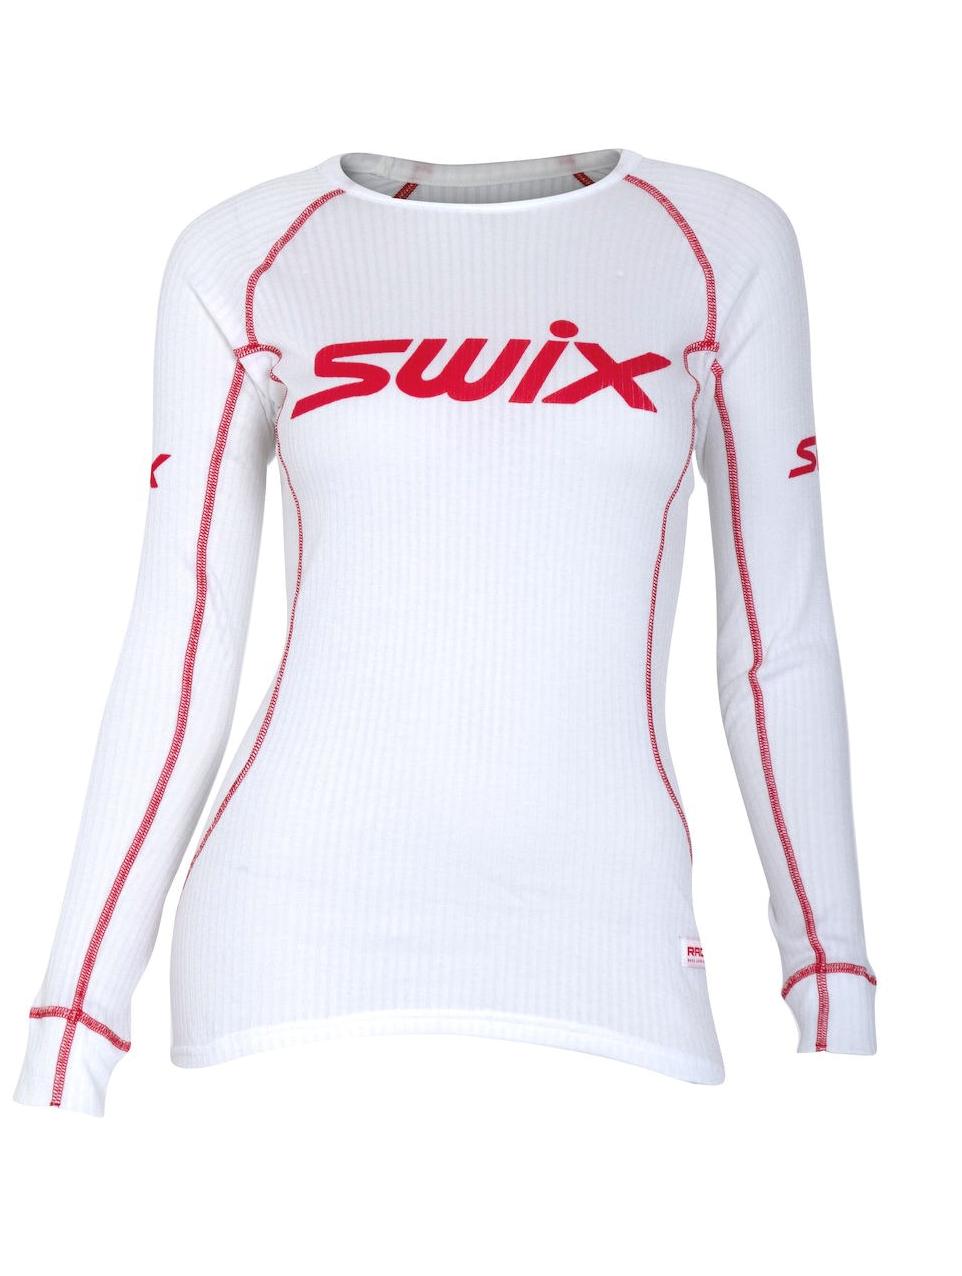 Bilde av Swix  RaceX bodyw LS W 40816-00000 Bright white